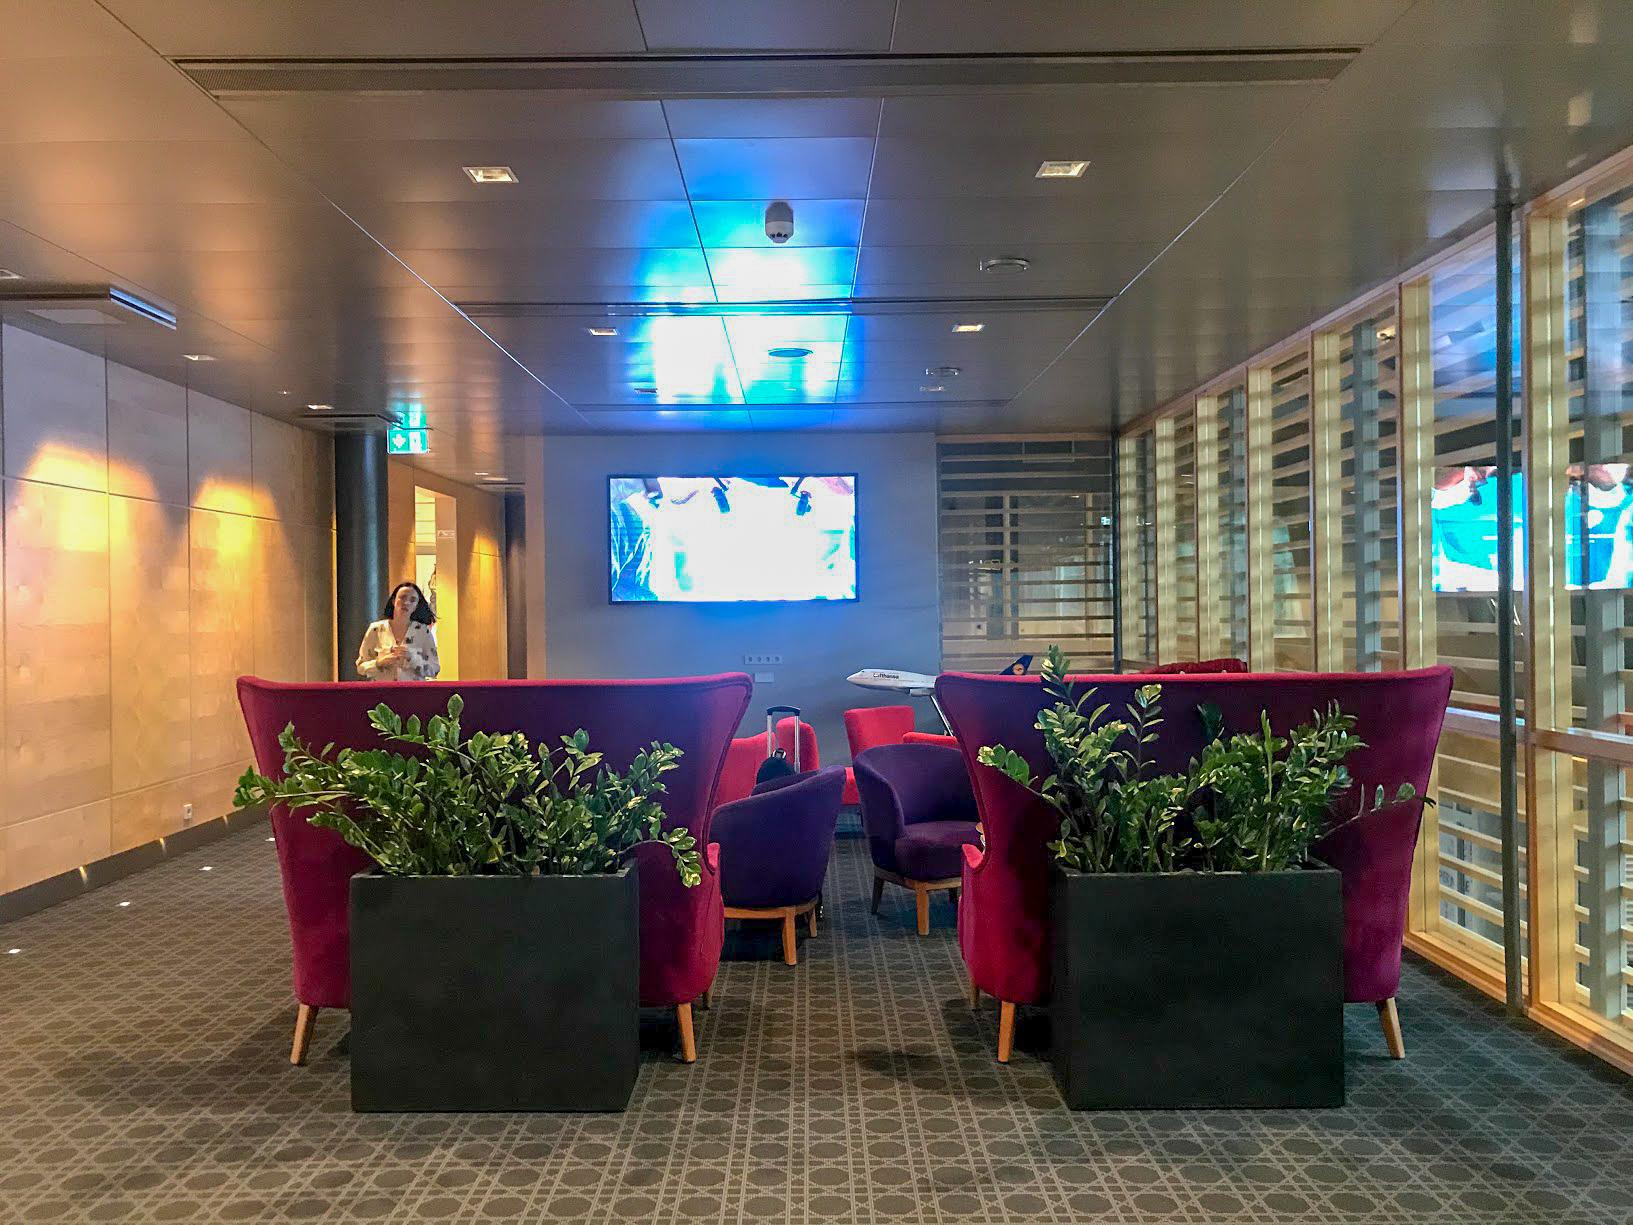 Primeclass Business Lounge at Riga International Airport